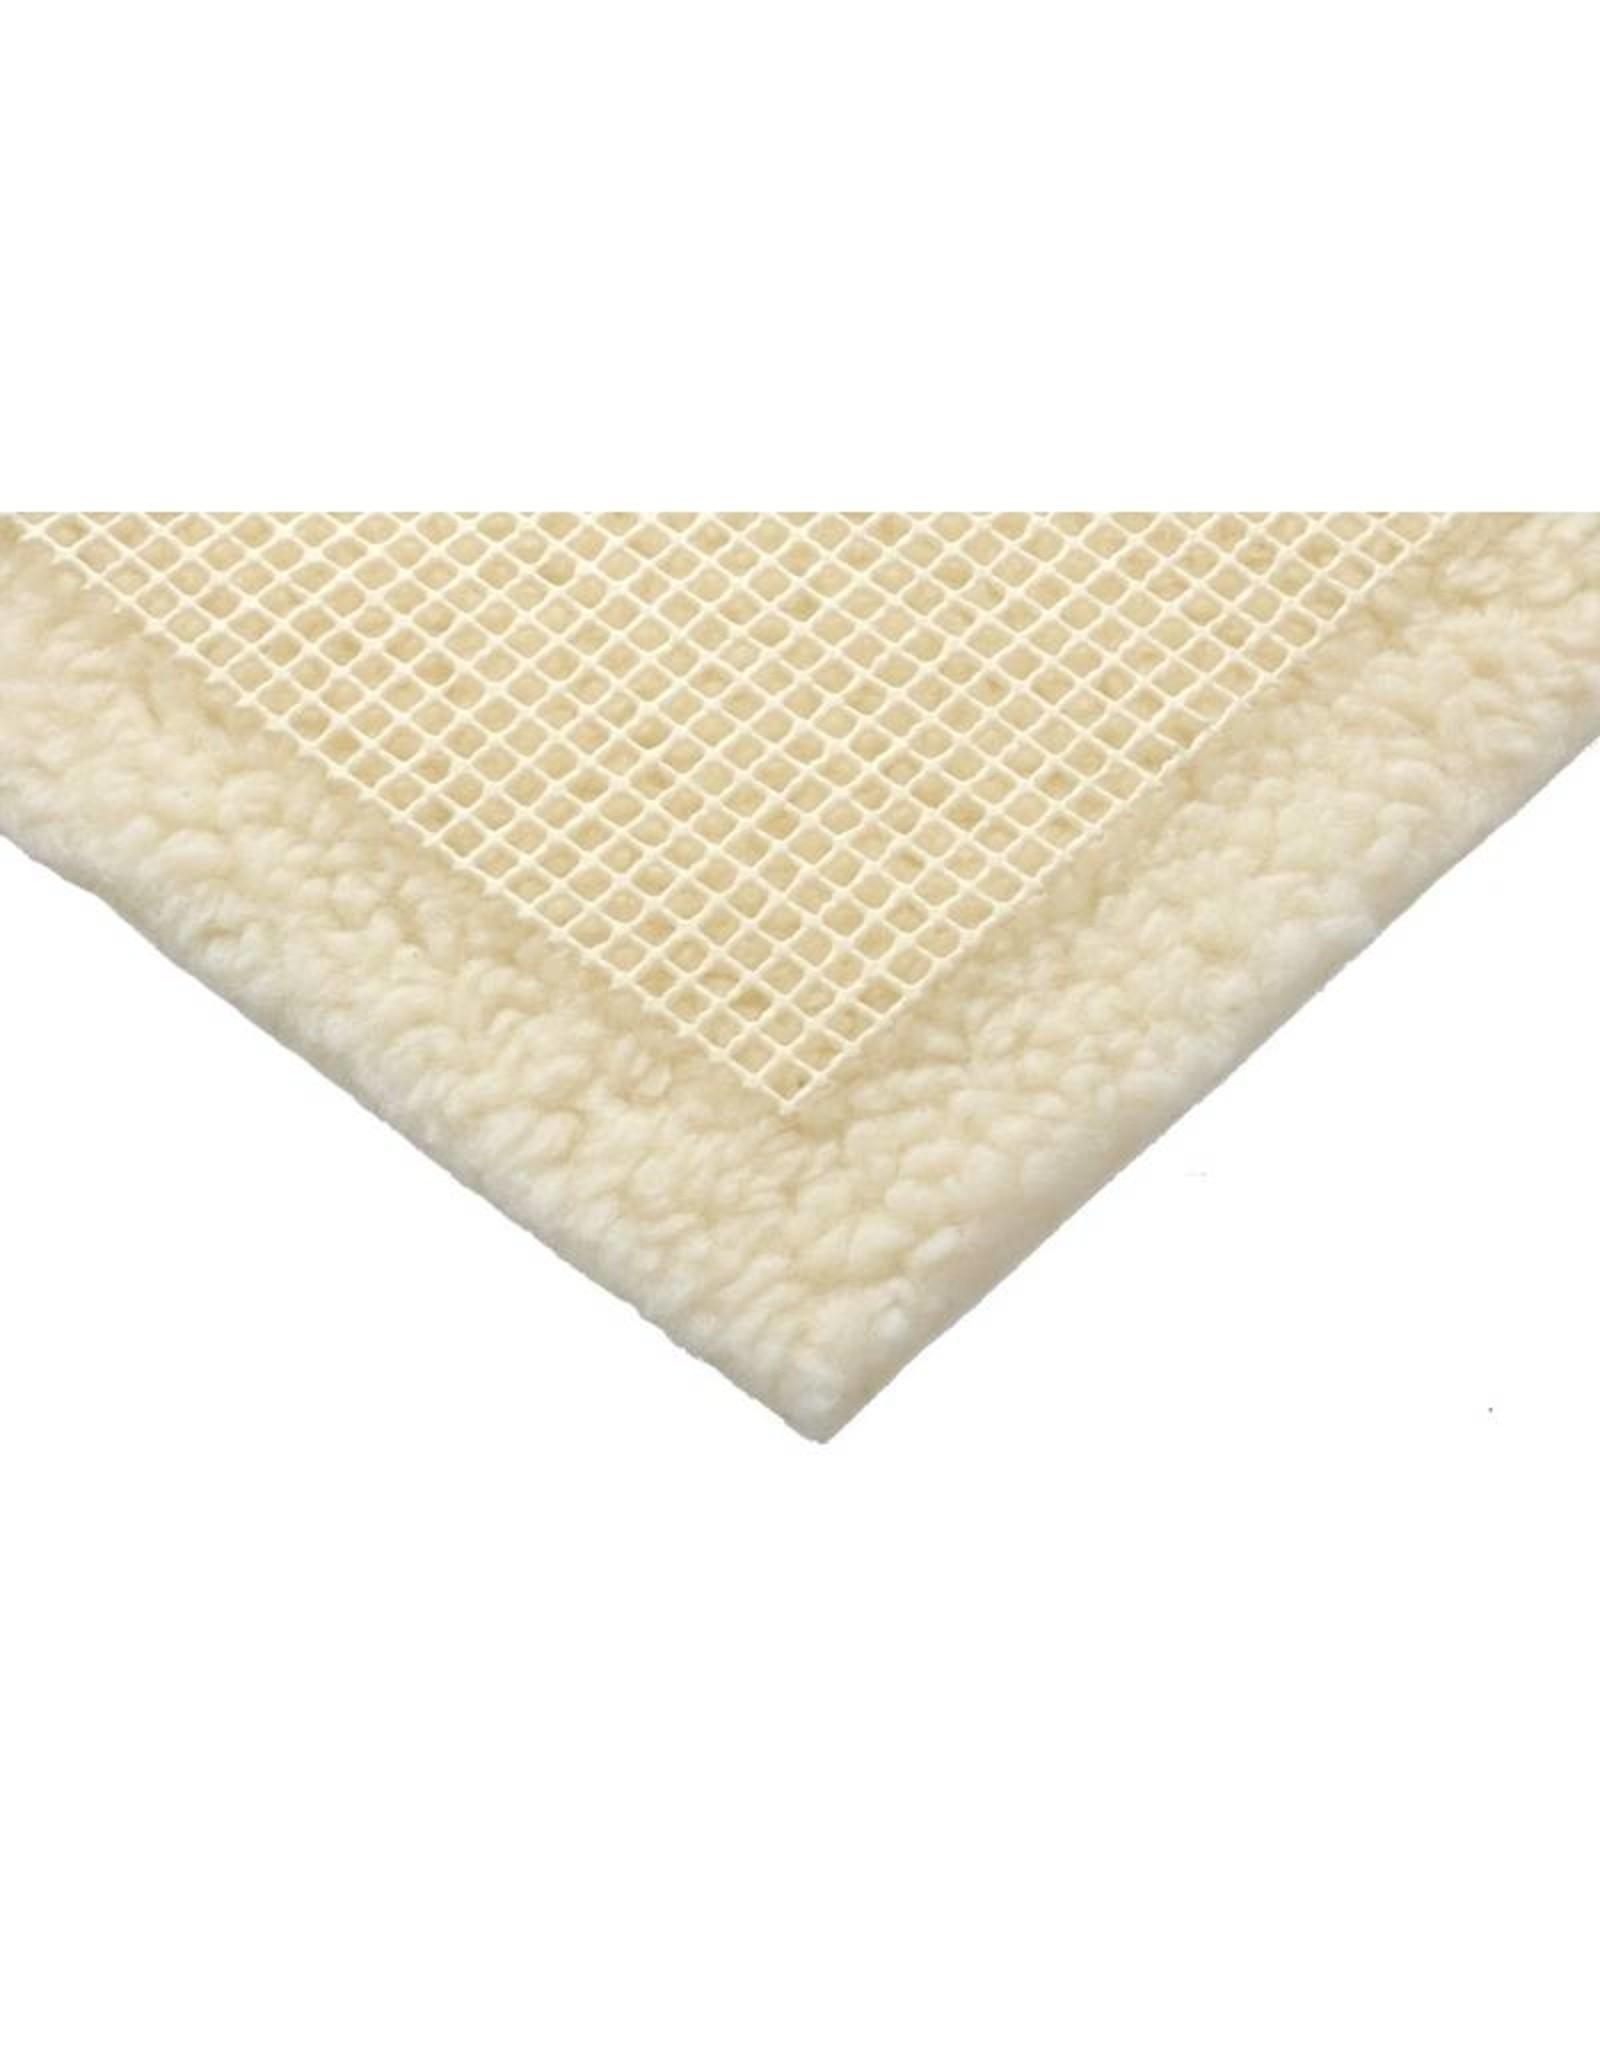 Mani Vivendi Yogamat Scheerwol 75x200x1,6cm